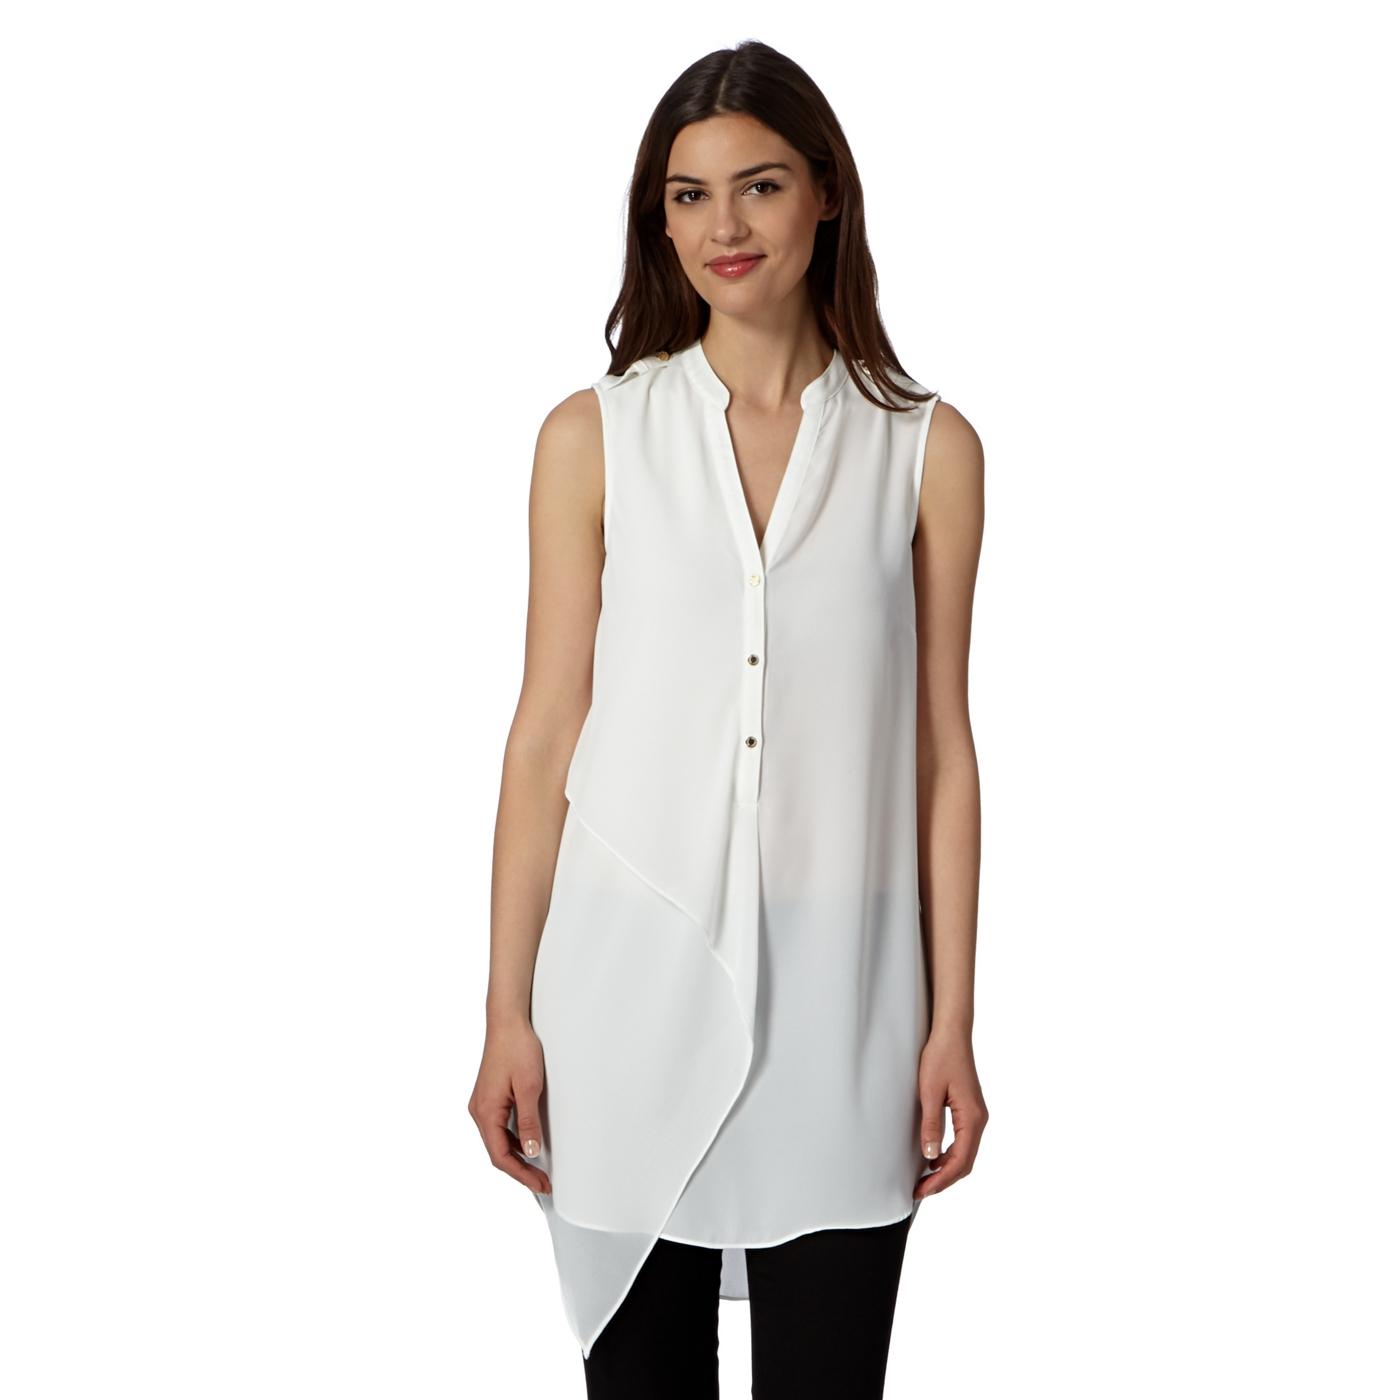 7f6edb6598b Star by Julien Macdonald Designer ivory asymmetric longline shirt on ...